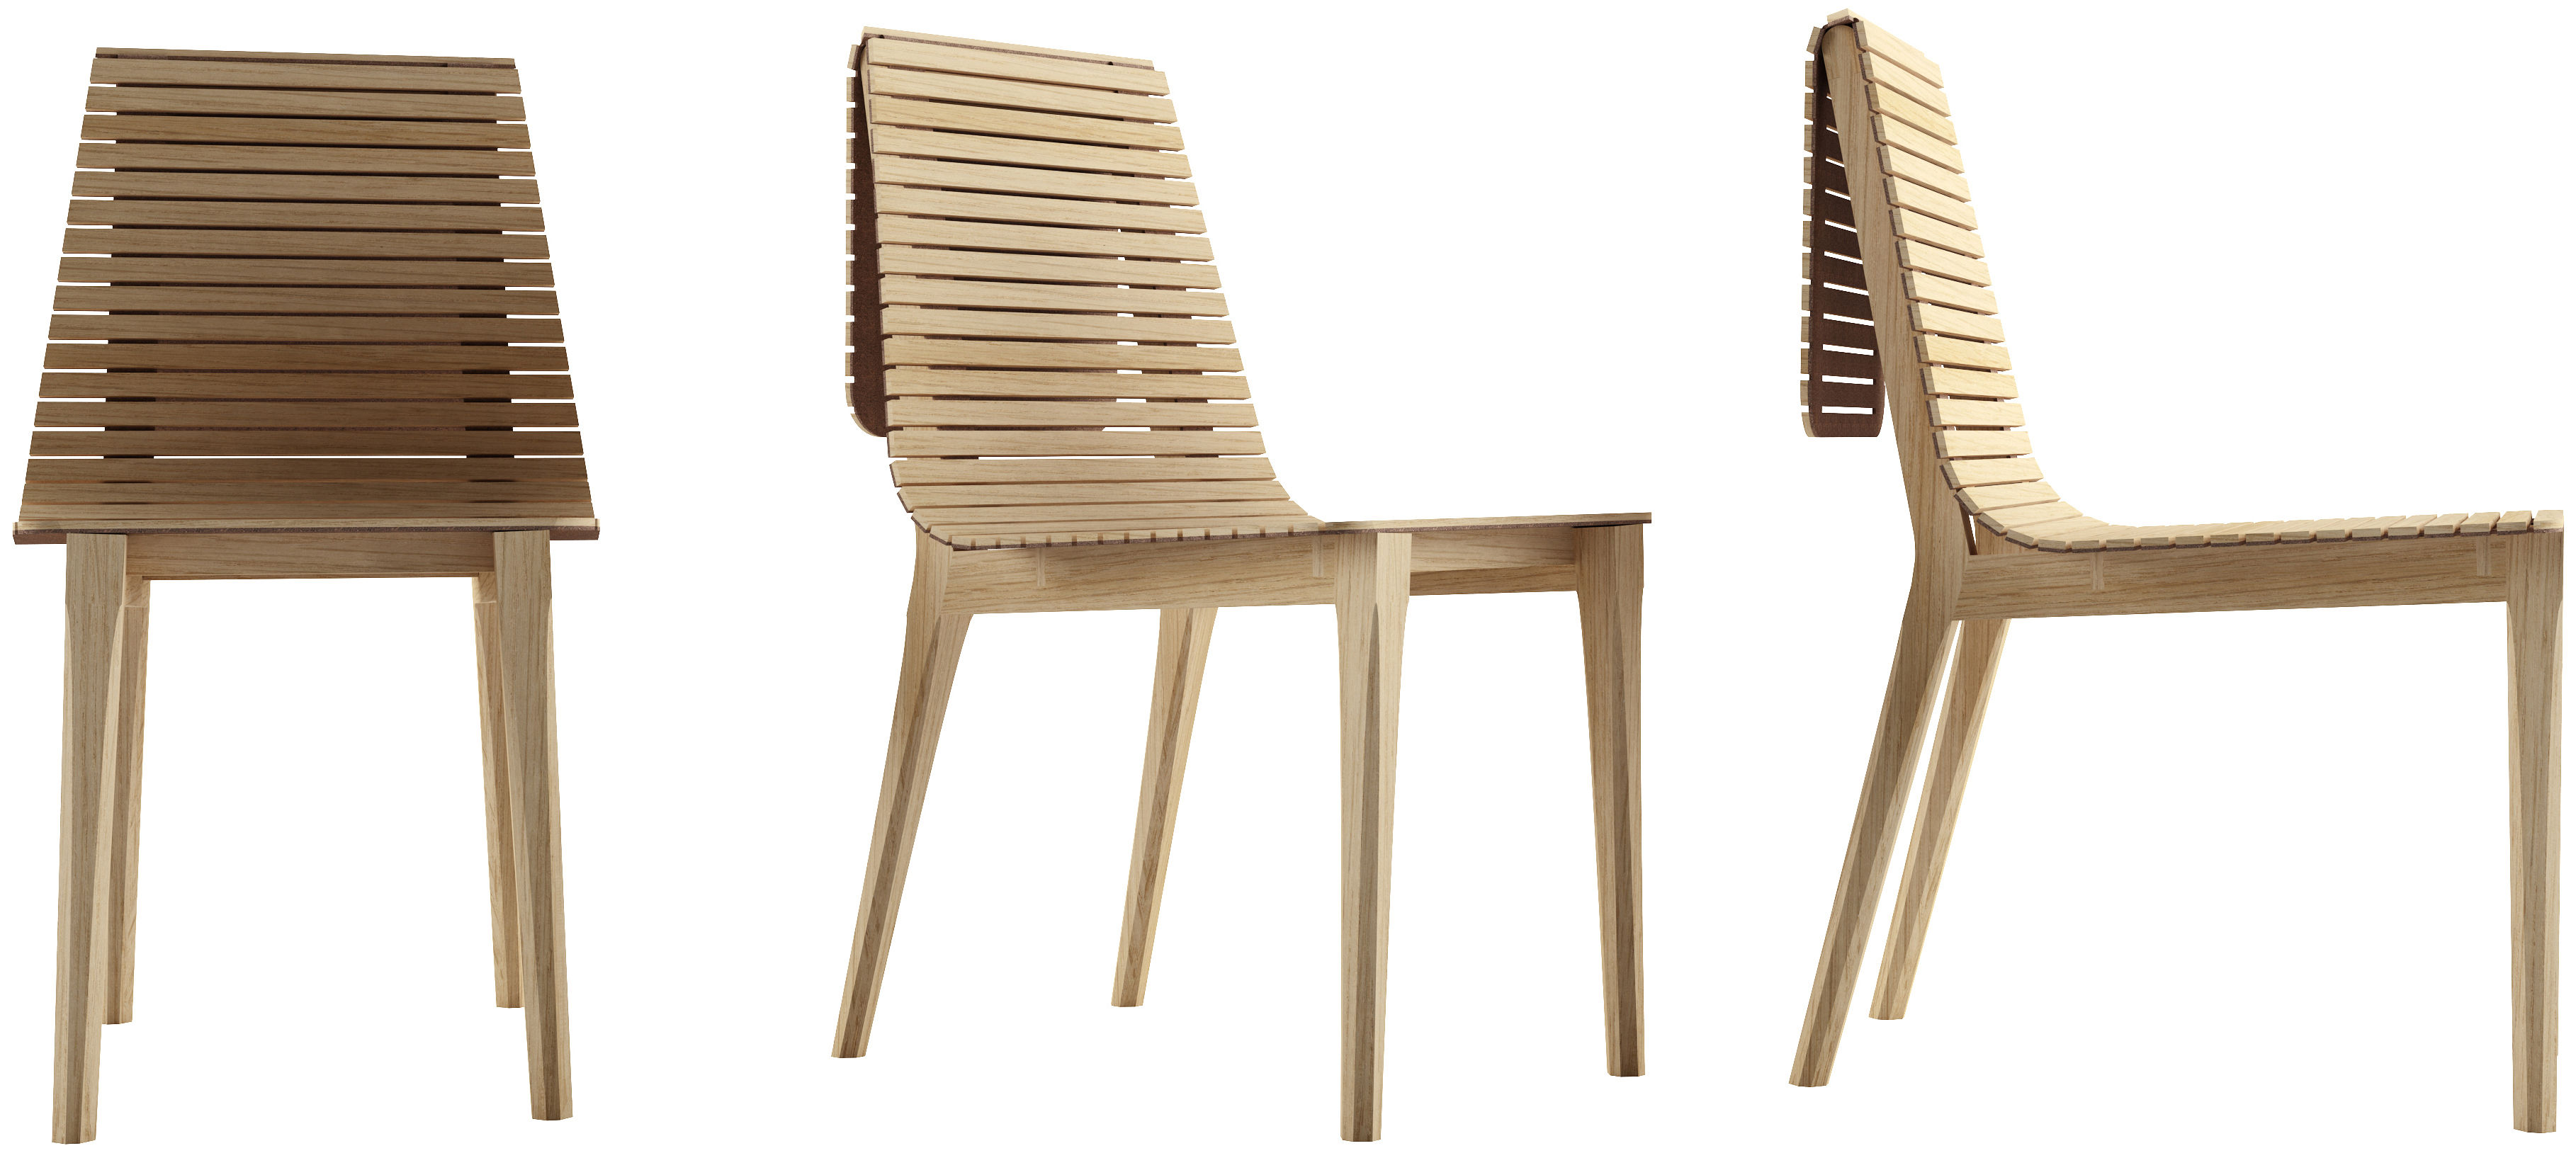 Chaise market bois clair petite friture - Chaise bois clair ...